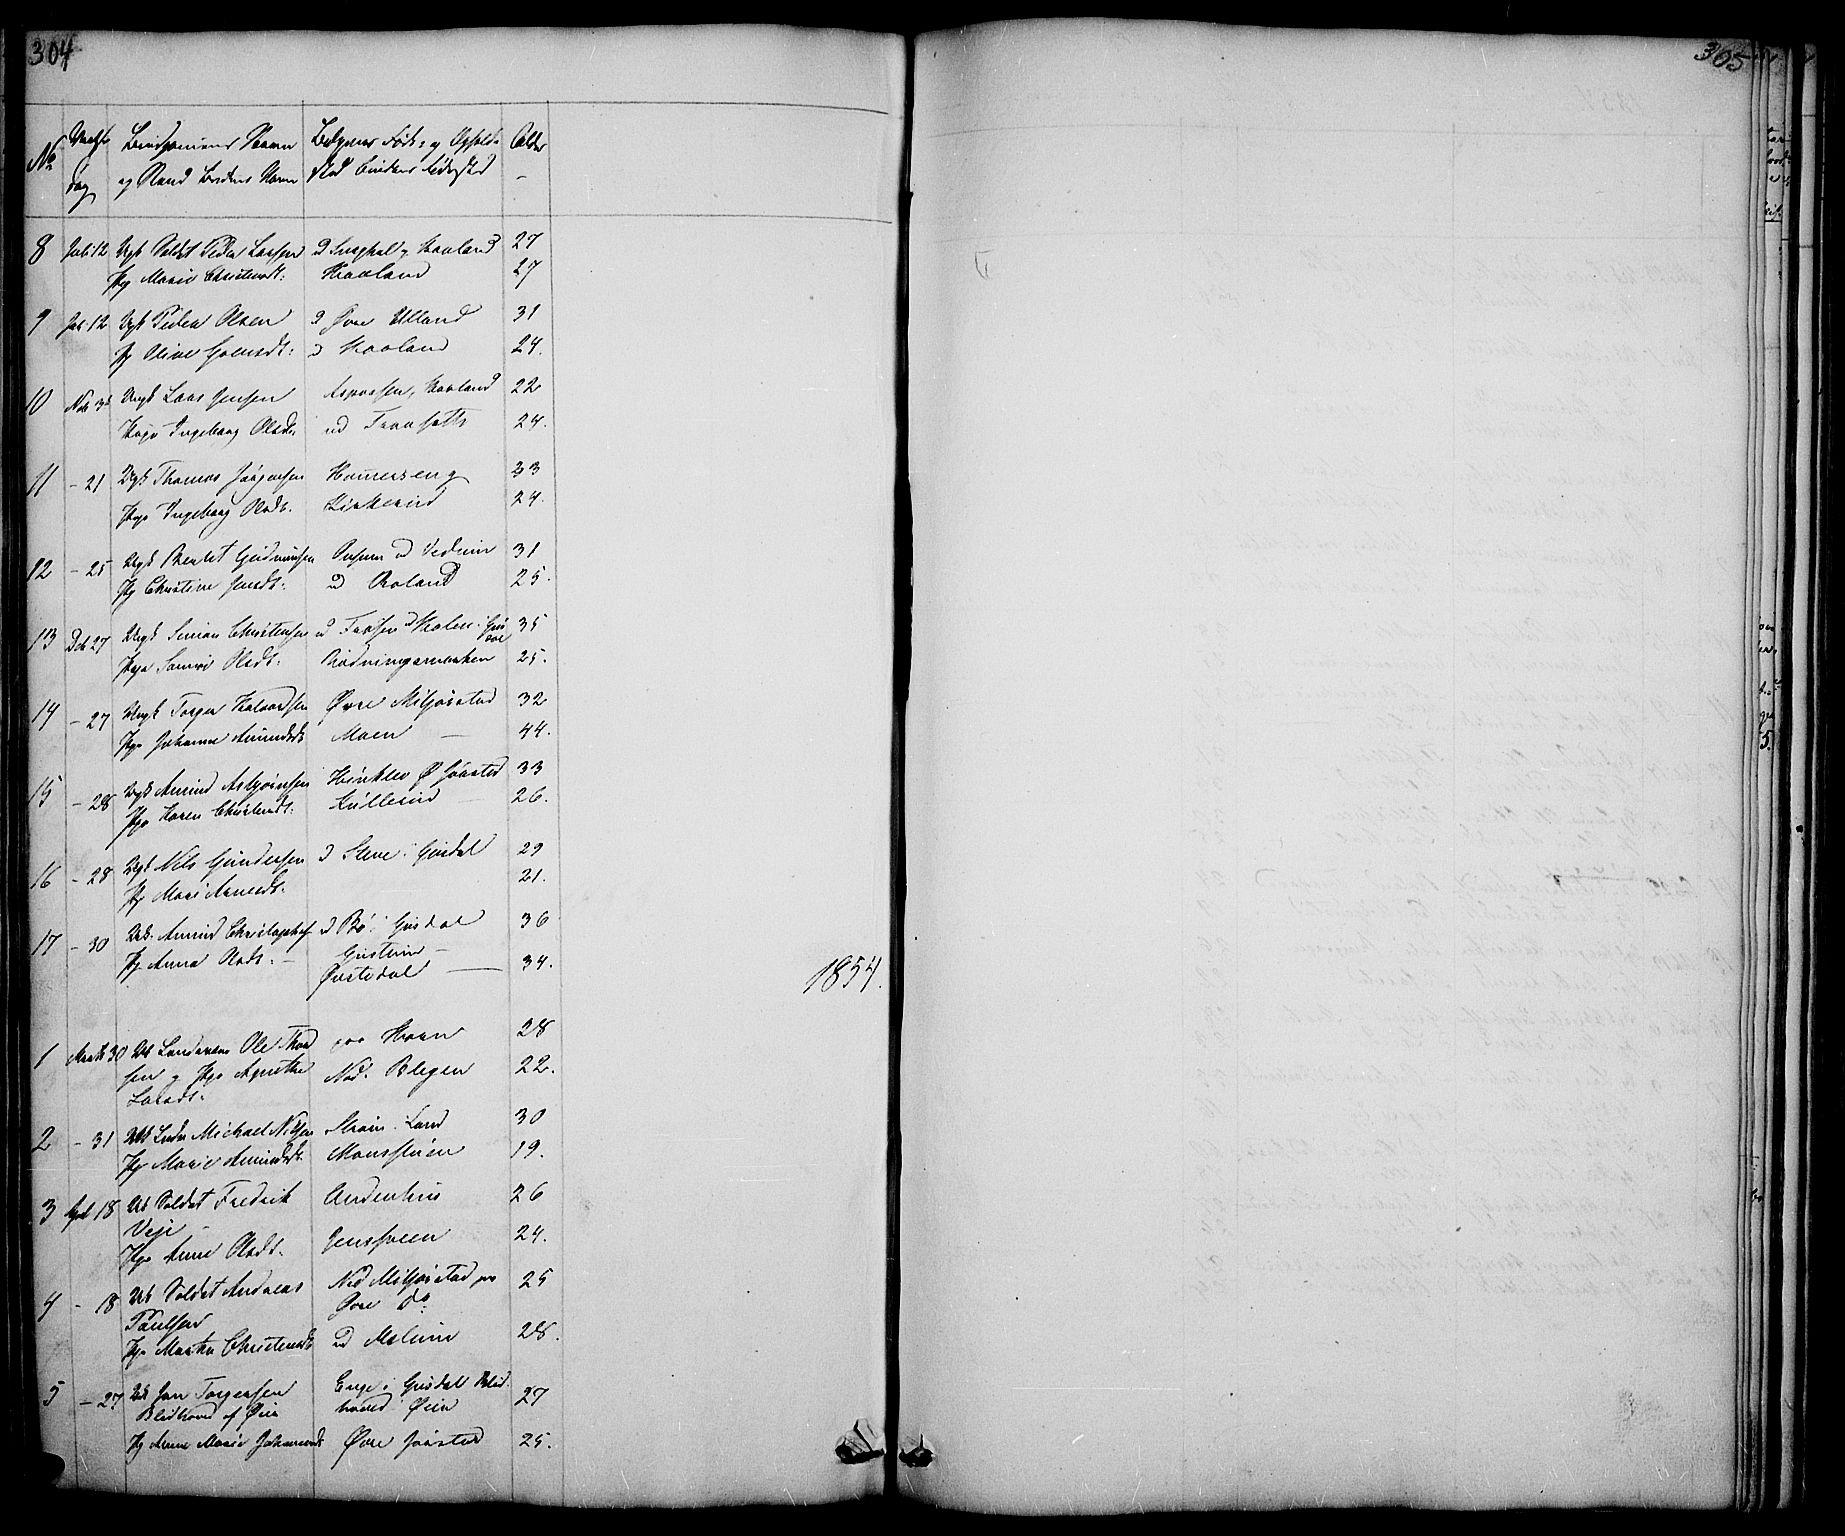 SAH, Fåberg prestekontor, Klokkerbok nr. 5, 1837-1864, s. 304-305